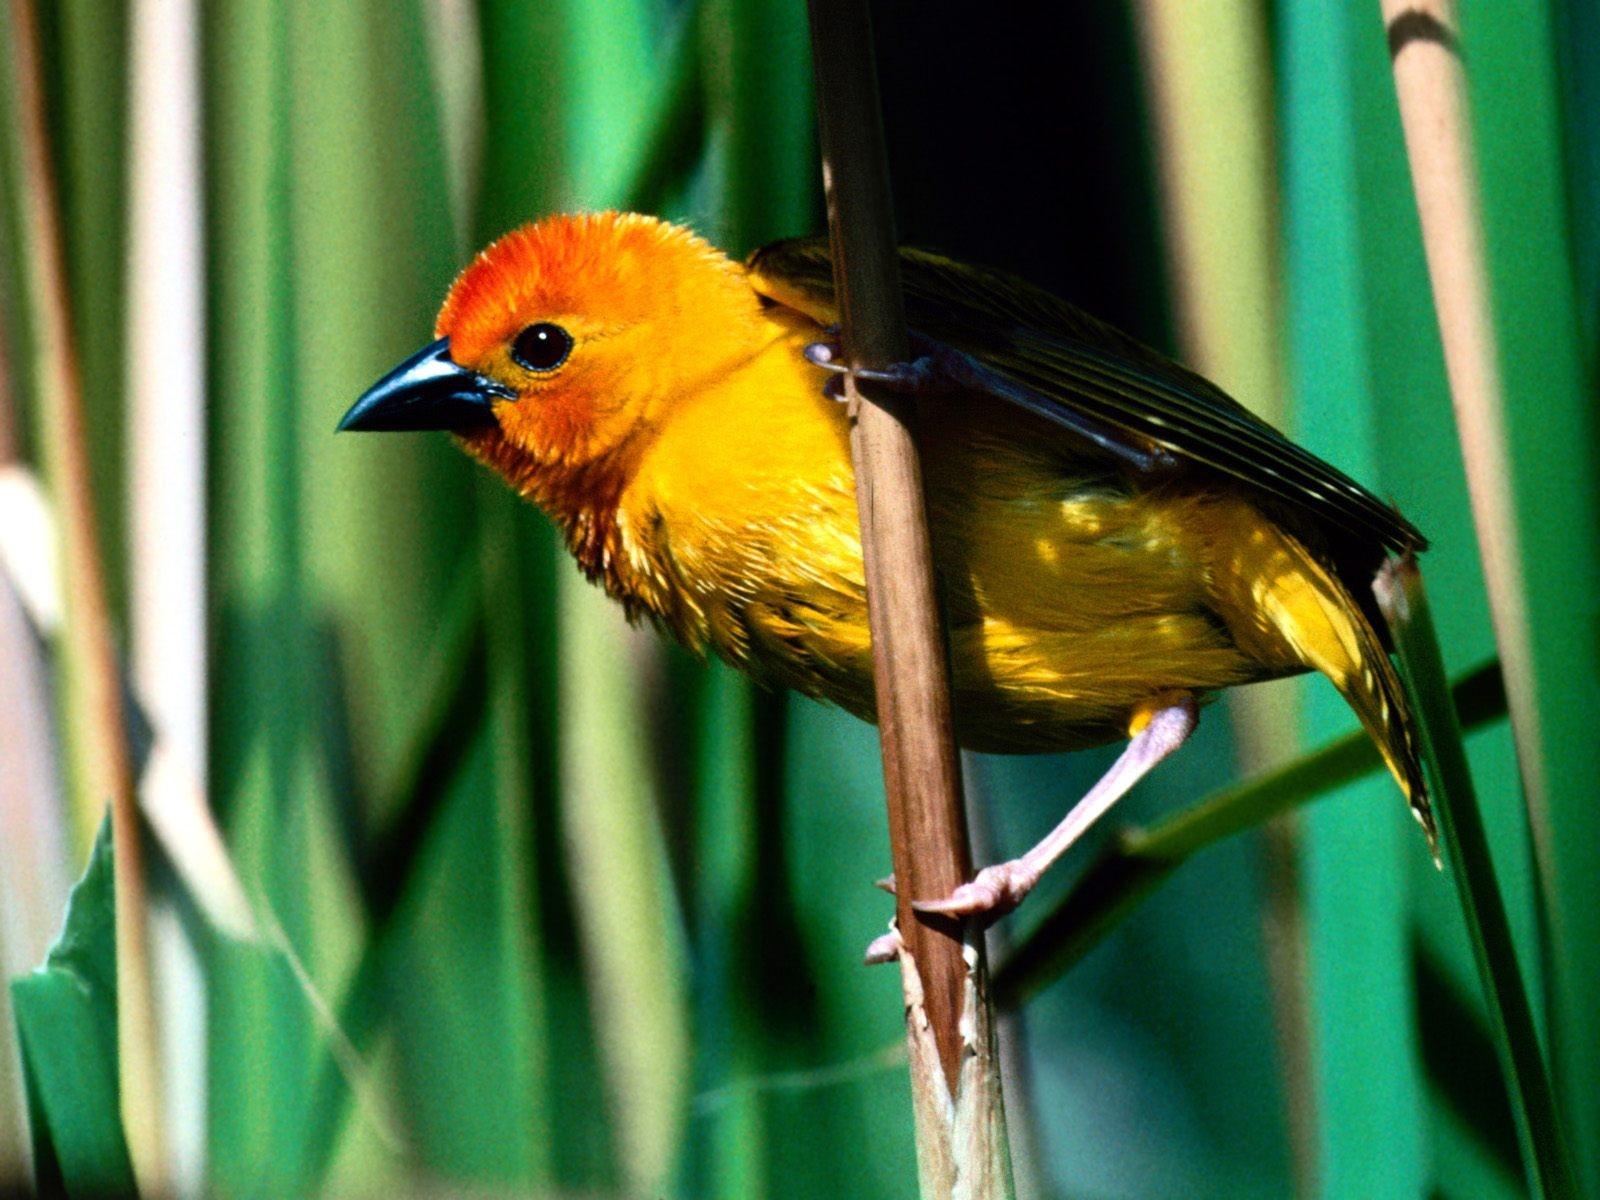 HD Nice Yellow Small Bird Wallpaper HD Wallpapers 1600x1200